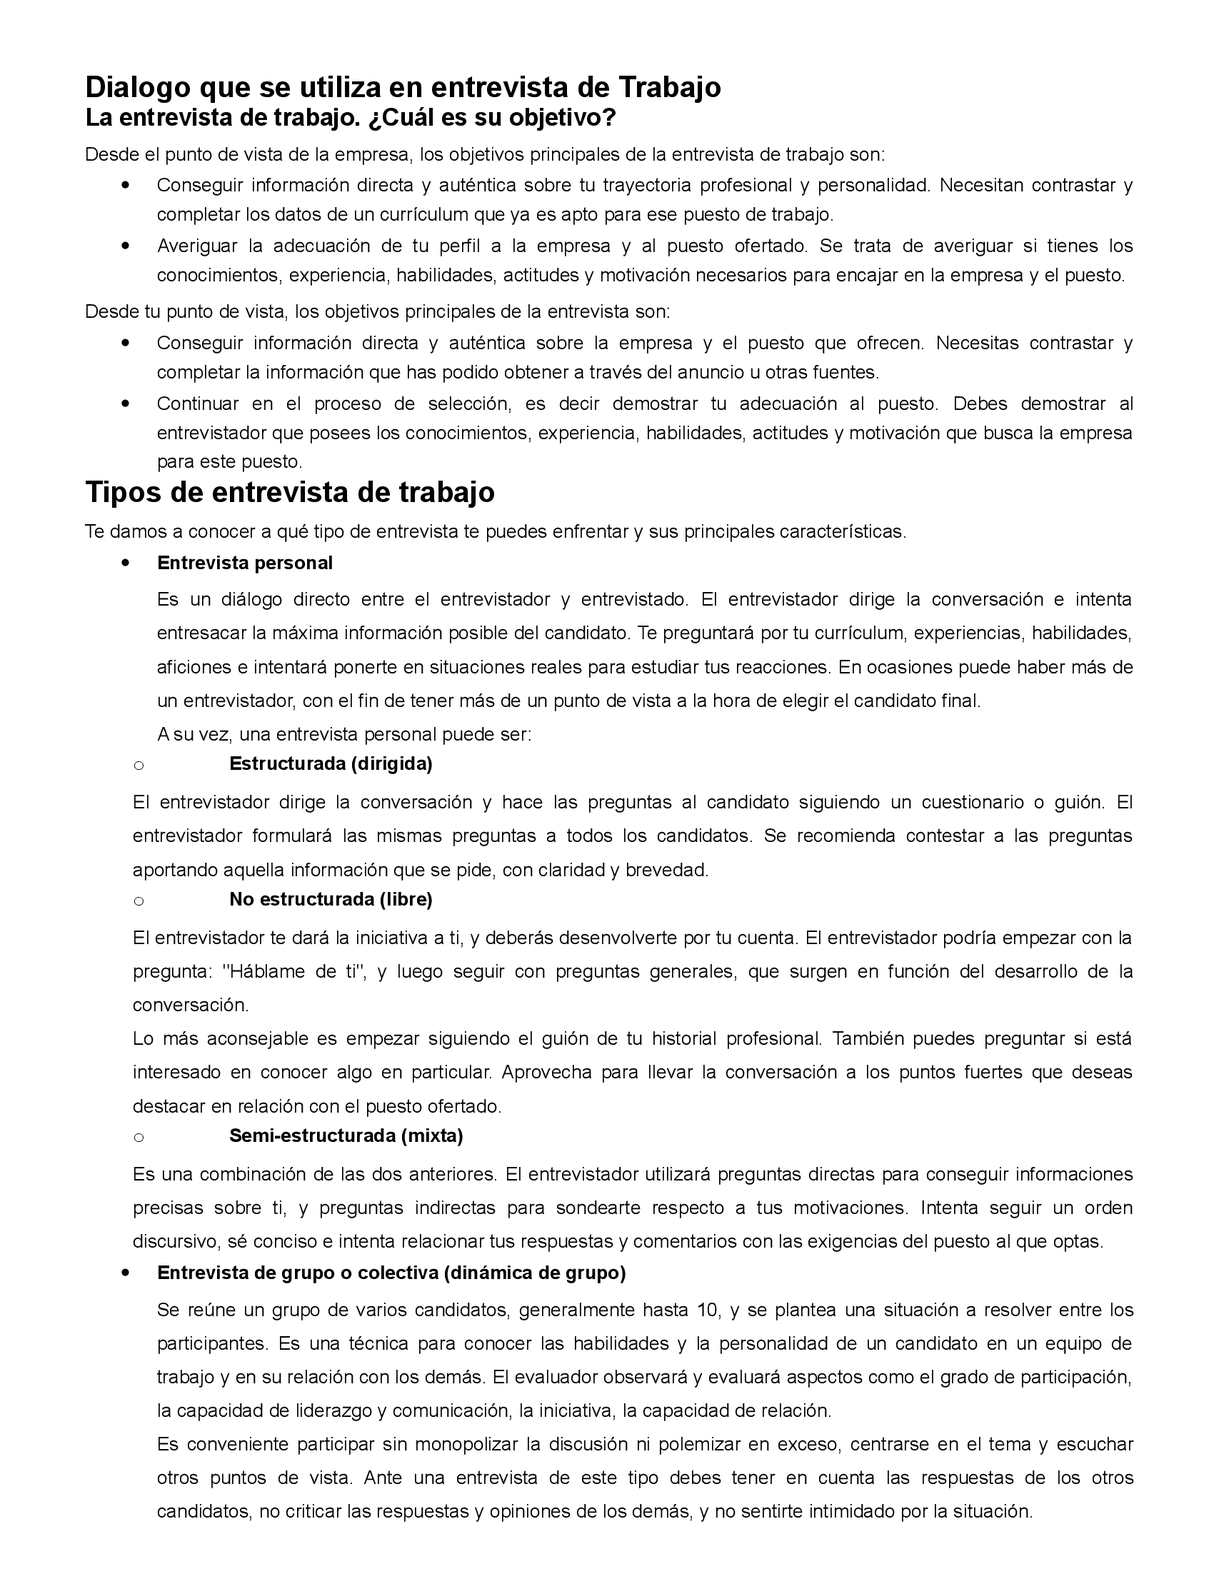 Calameo Dialogo Que Se Utiliza En Entrevista De Trabajo